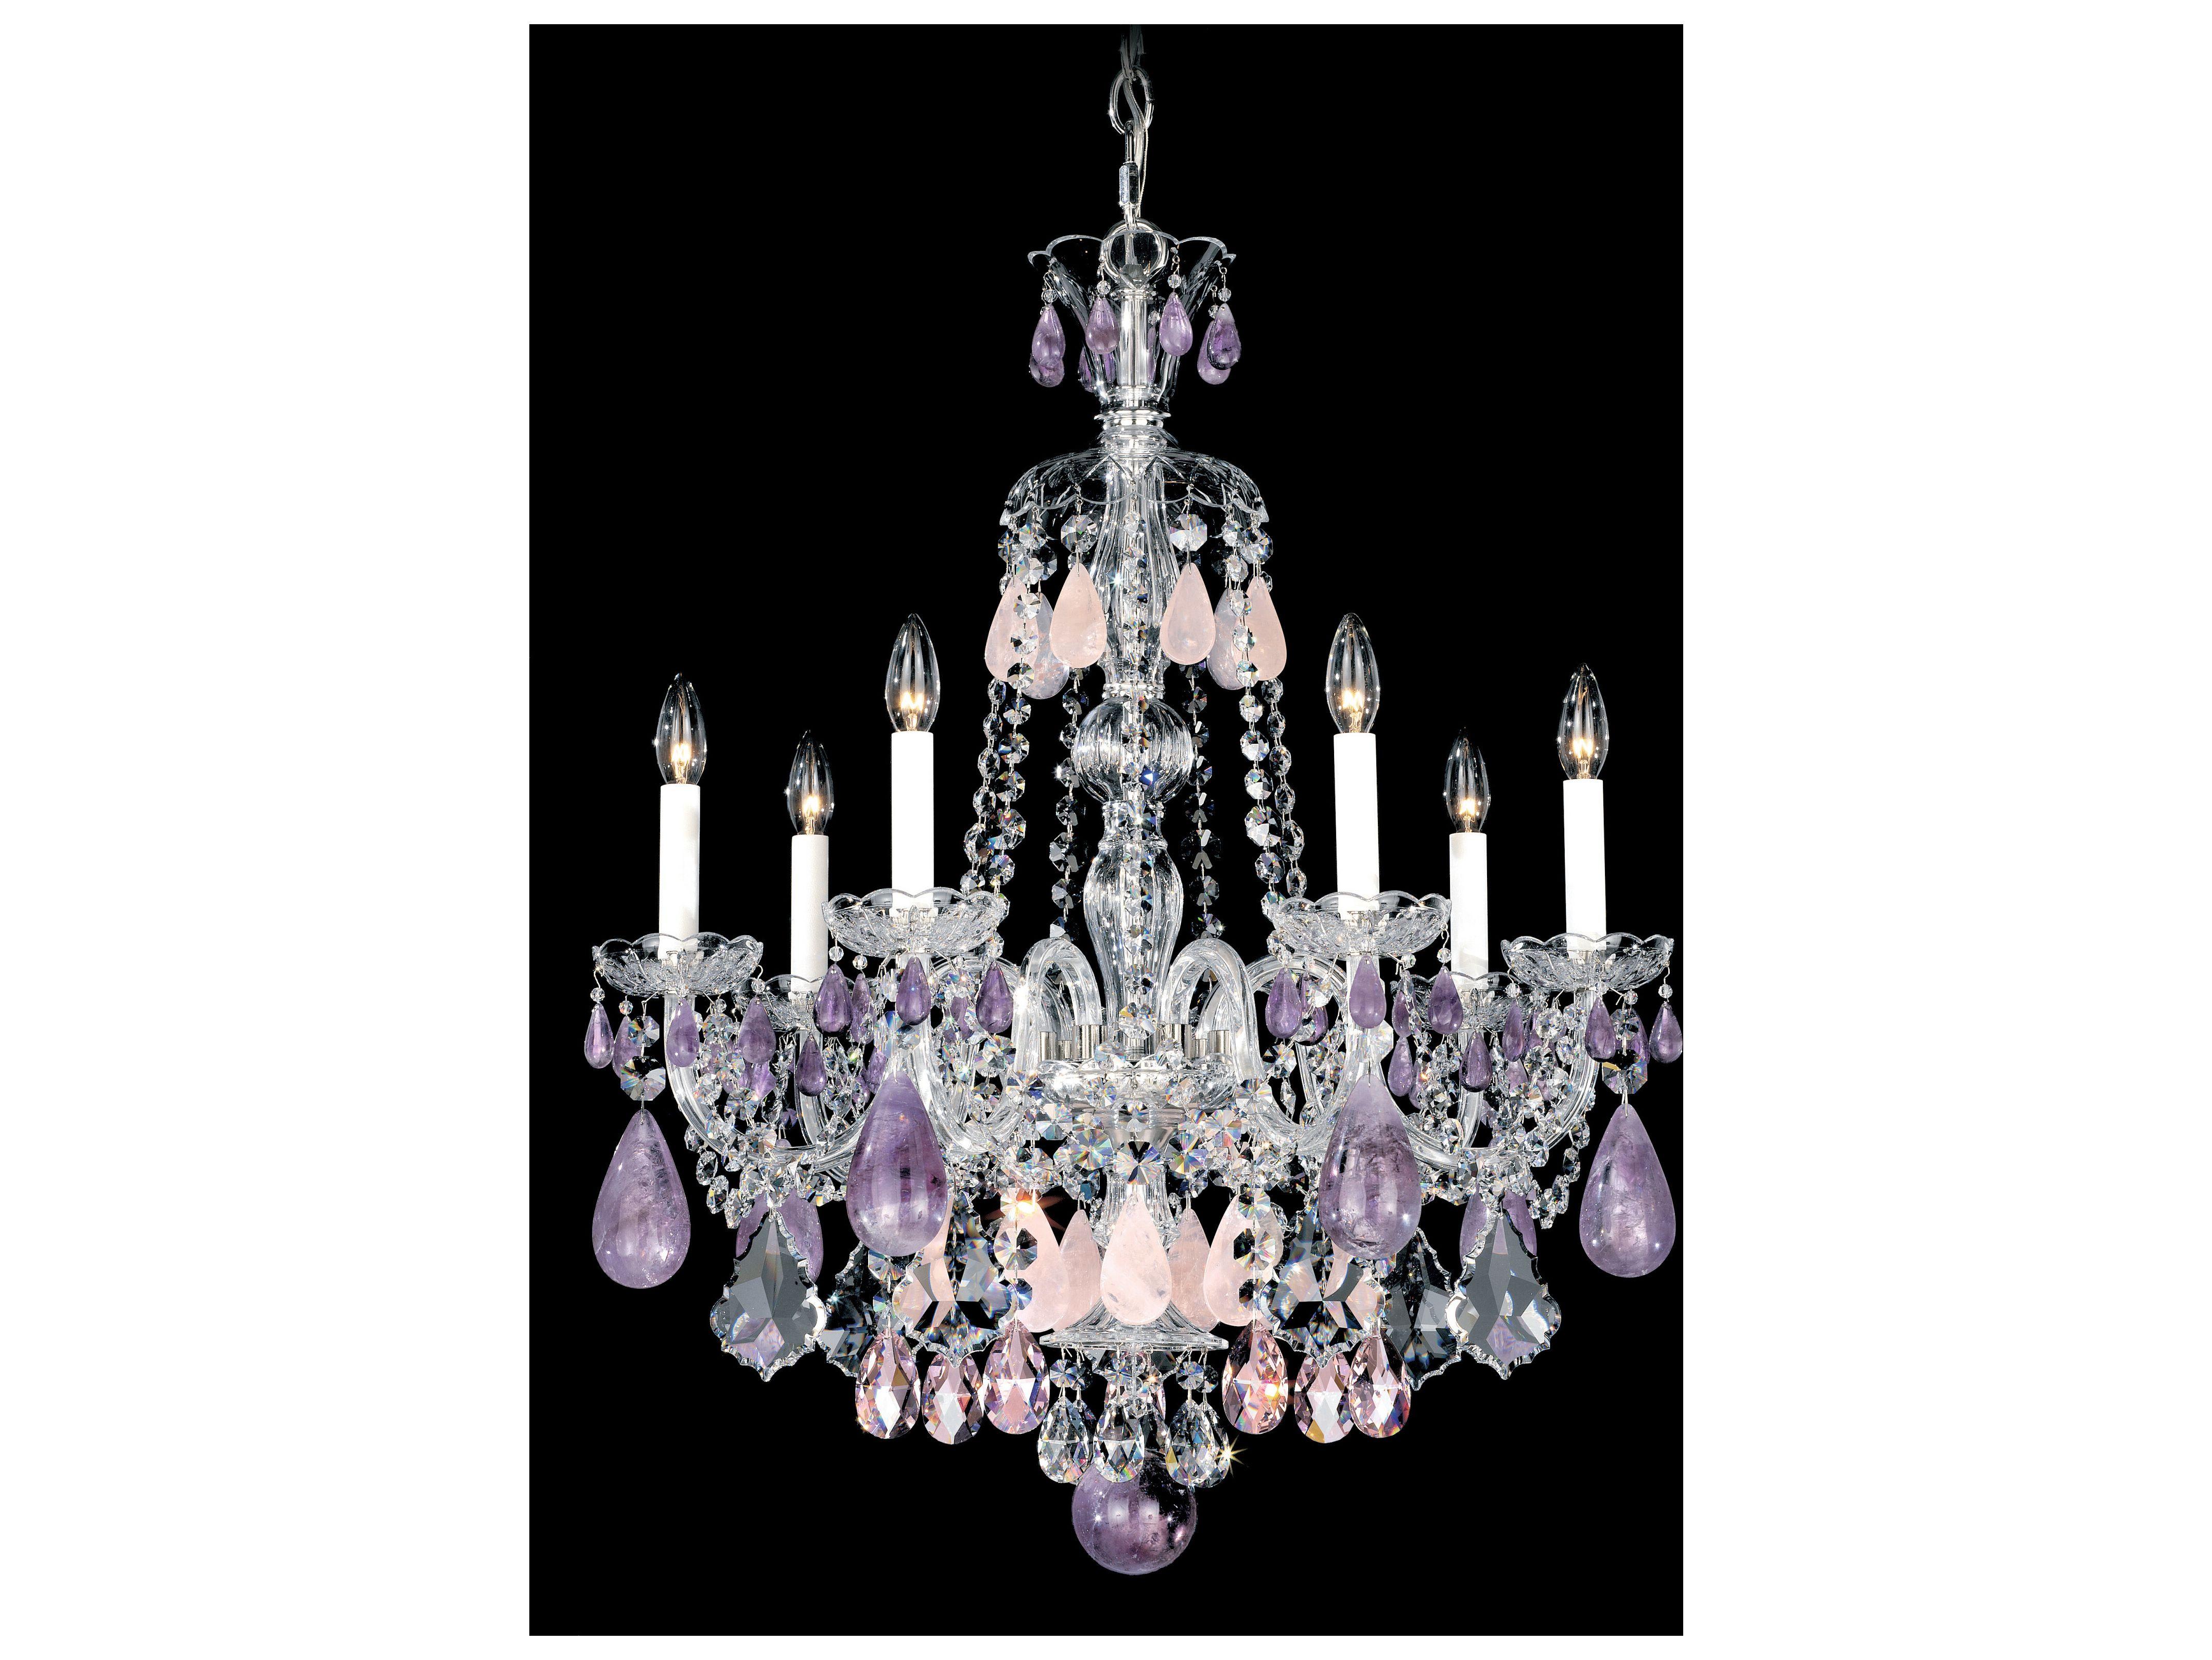 and ch bronze rock antique elements light crystal chandelier sophia